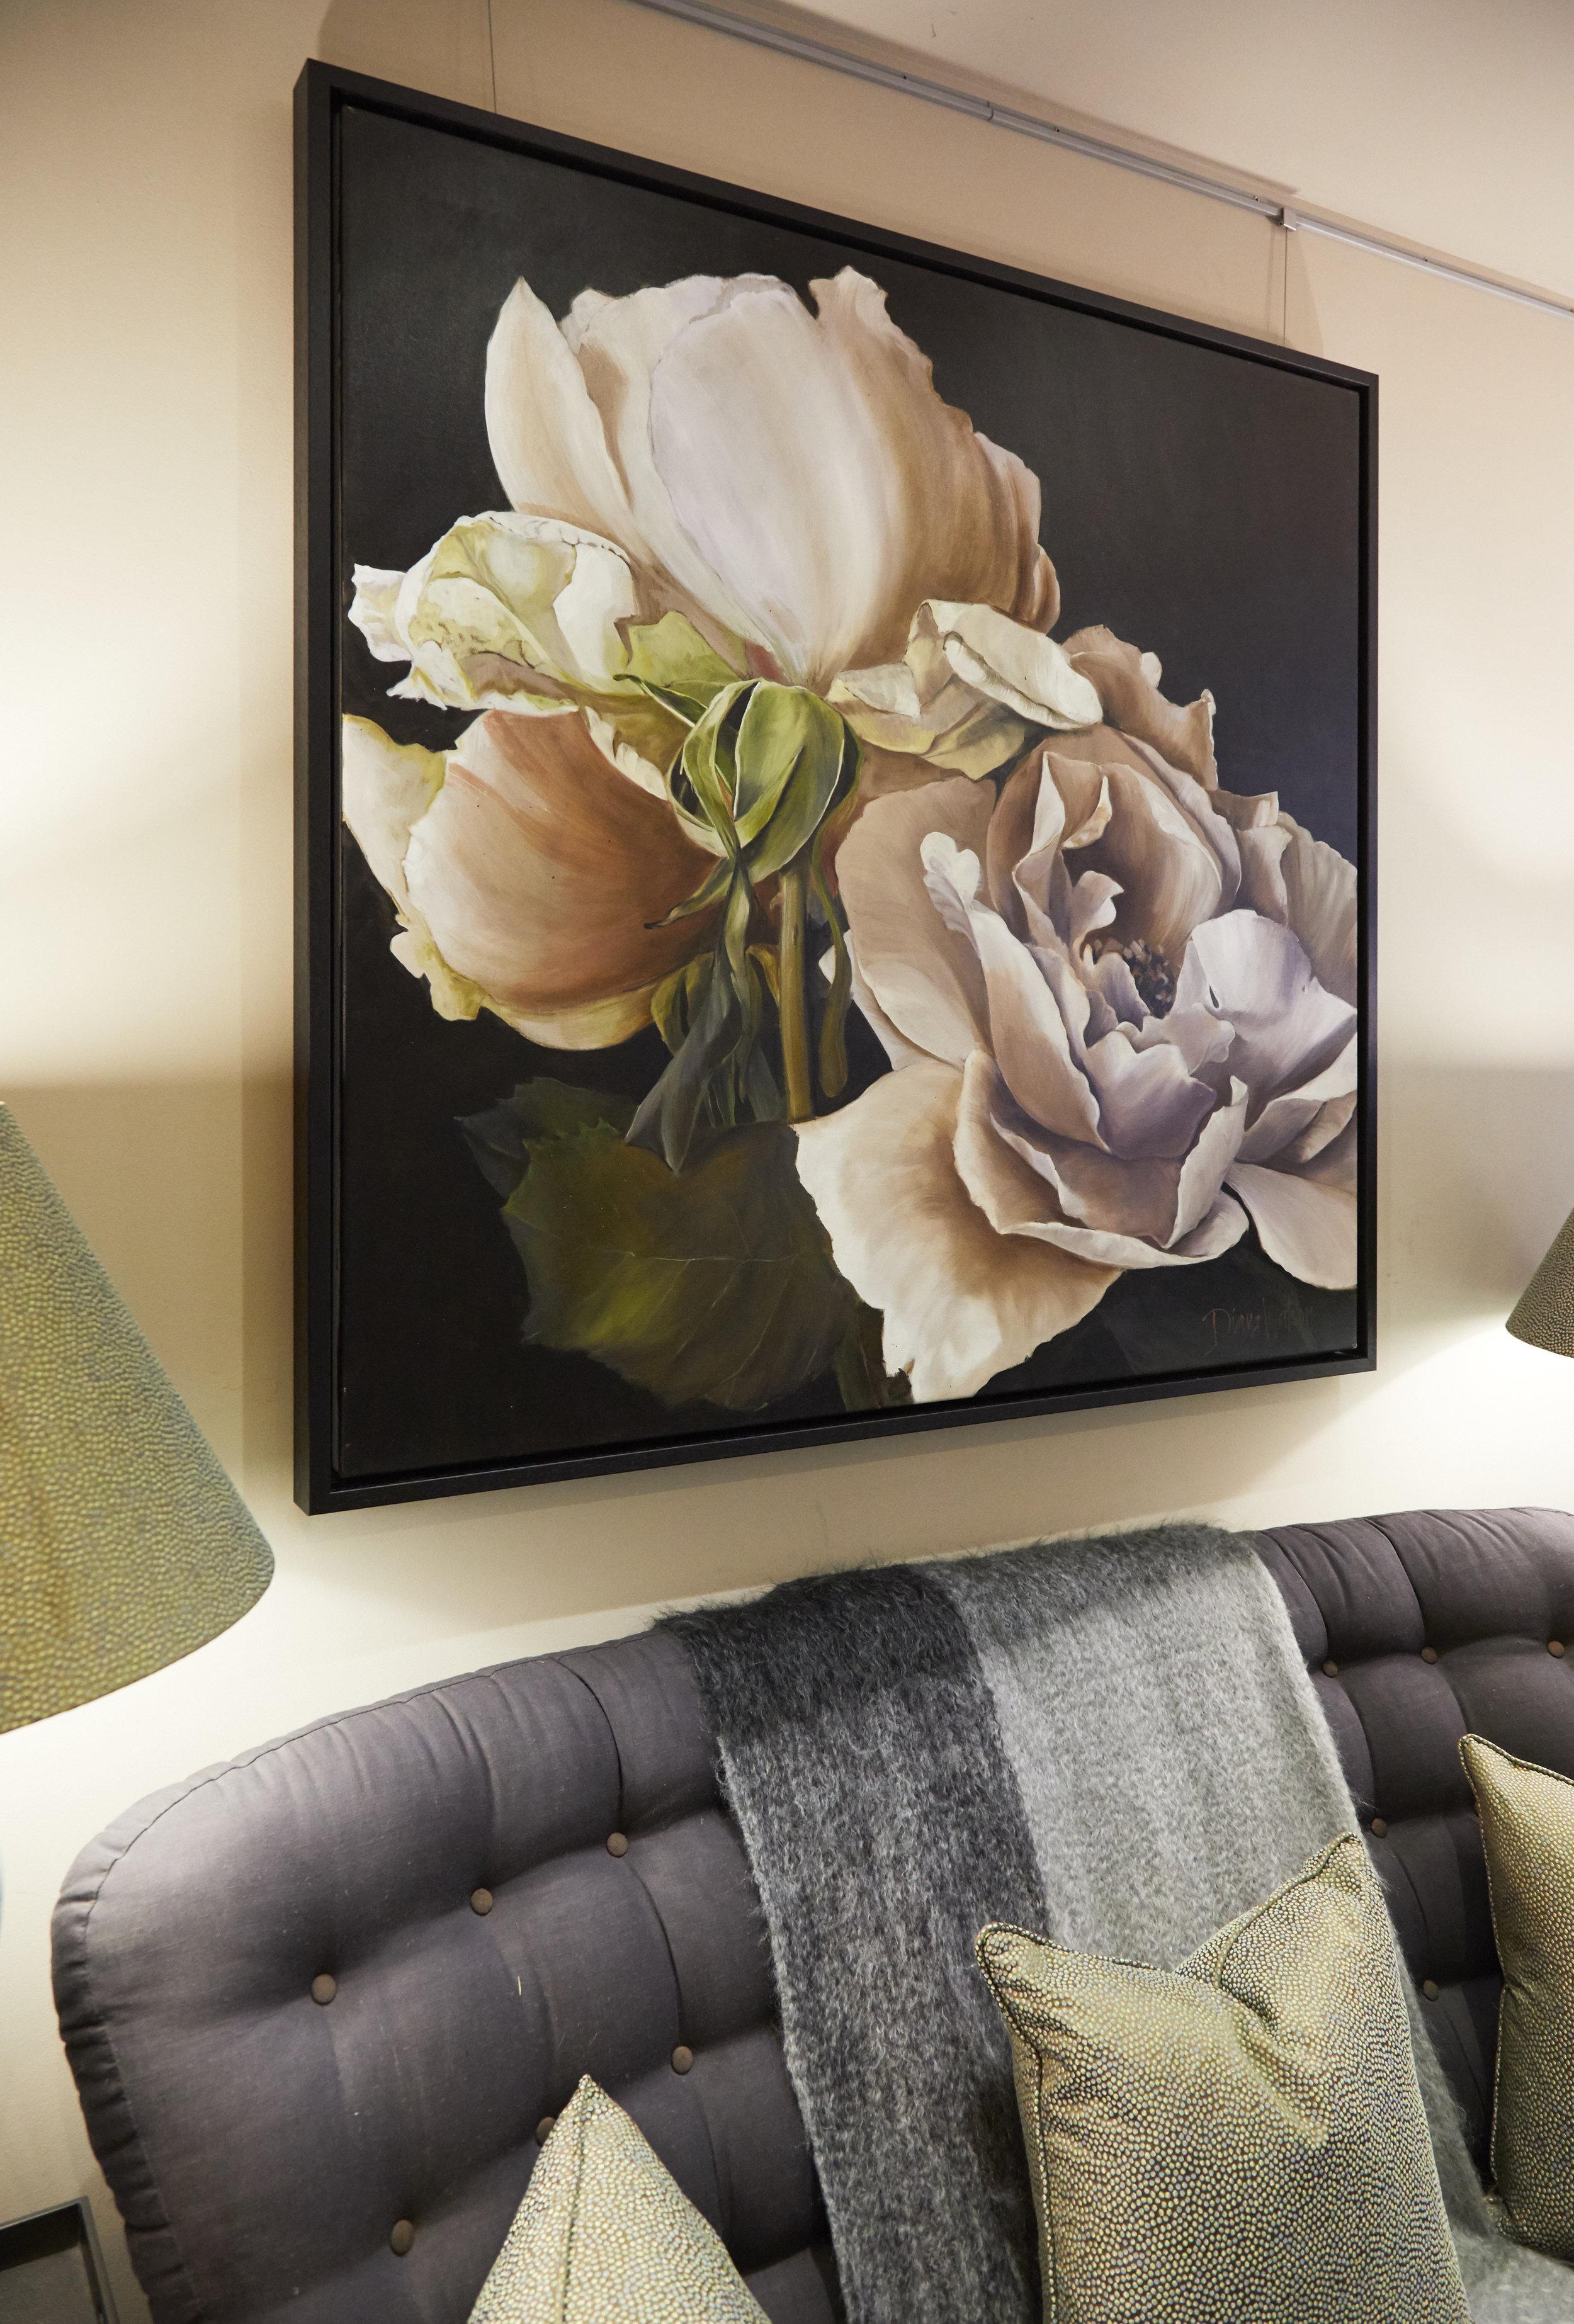 Diana Watson, Donizetti - Oil on Belgian linen in s dark wood tray frame122 x 122cm